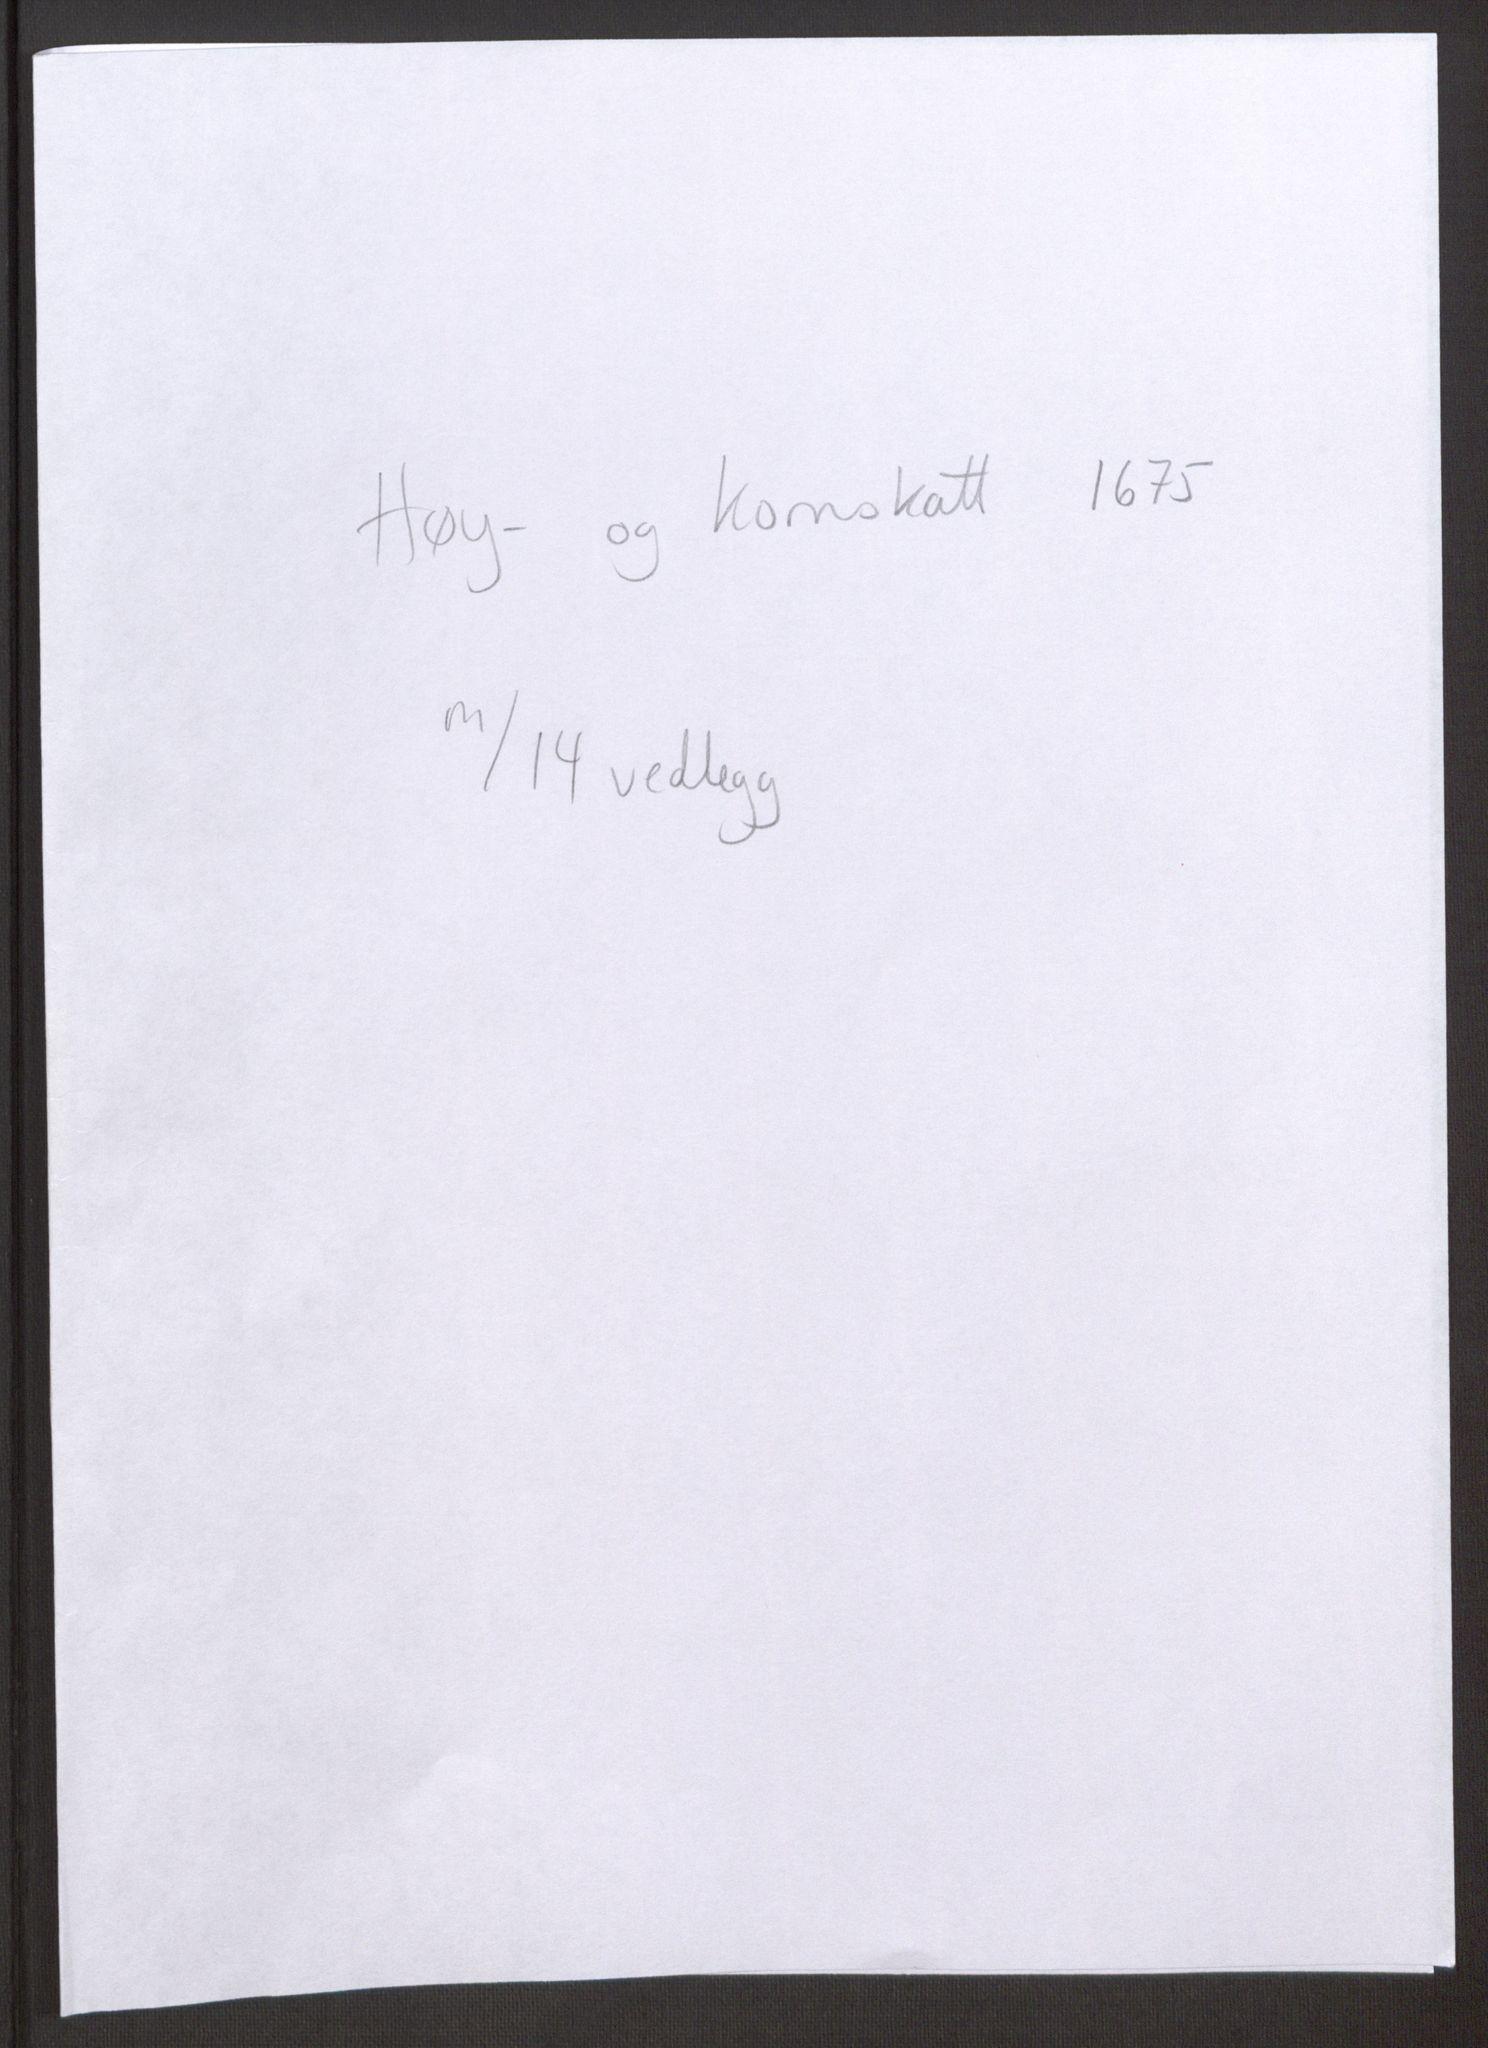 RA, Rentekammeret inntil 1814, Reviderte regnskaper, Fogderegnskap, R32/L1844: Fogderegnskap Jarlsberg grevskap, 1674-1675, s. 269